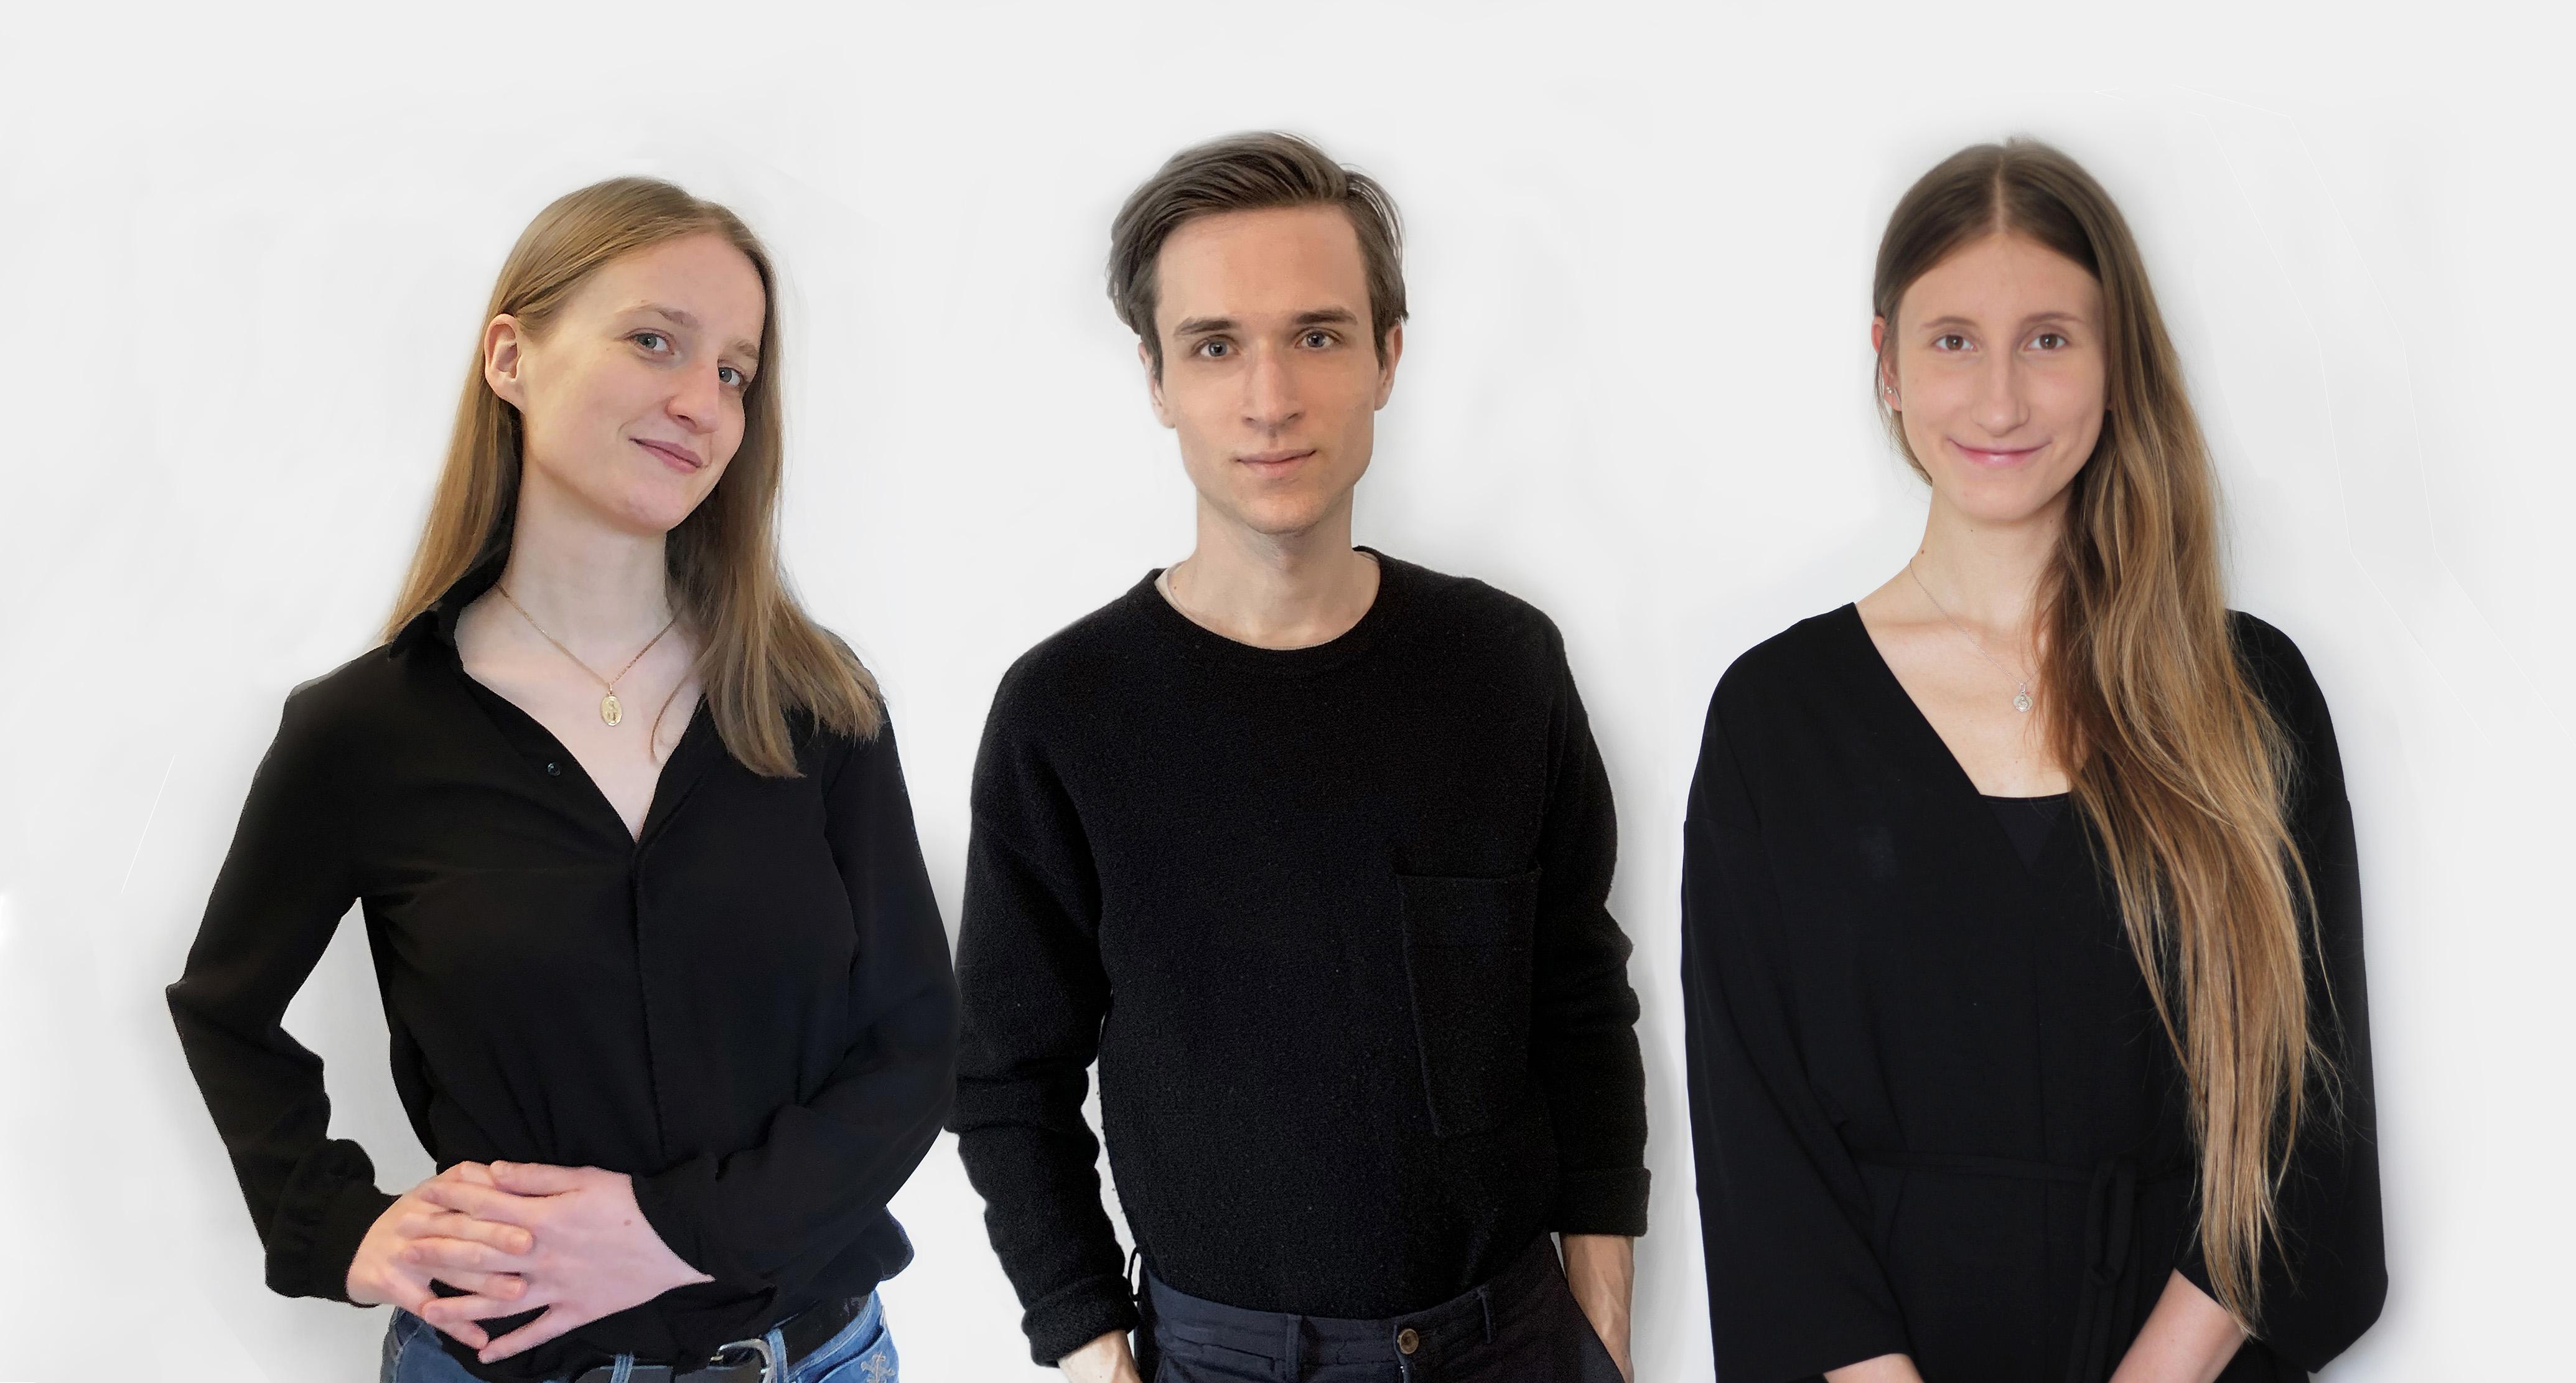 winner of kaira looro architecture competition 2021 Aleksandra Wróbel, Agnieszka Witaszek, Kamil Owczarek